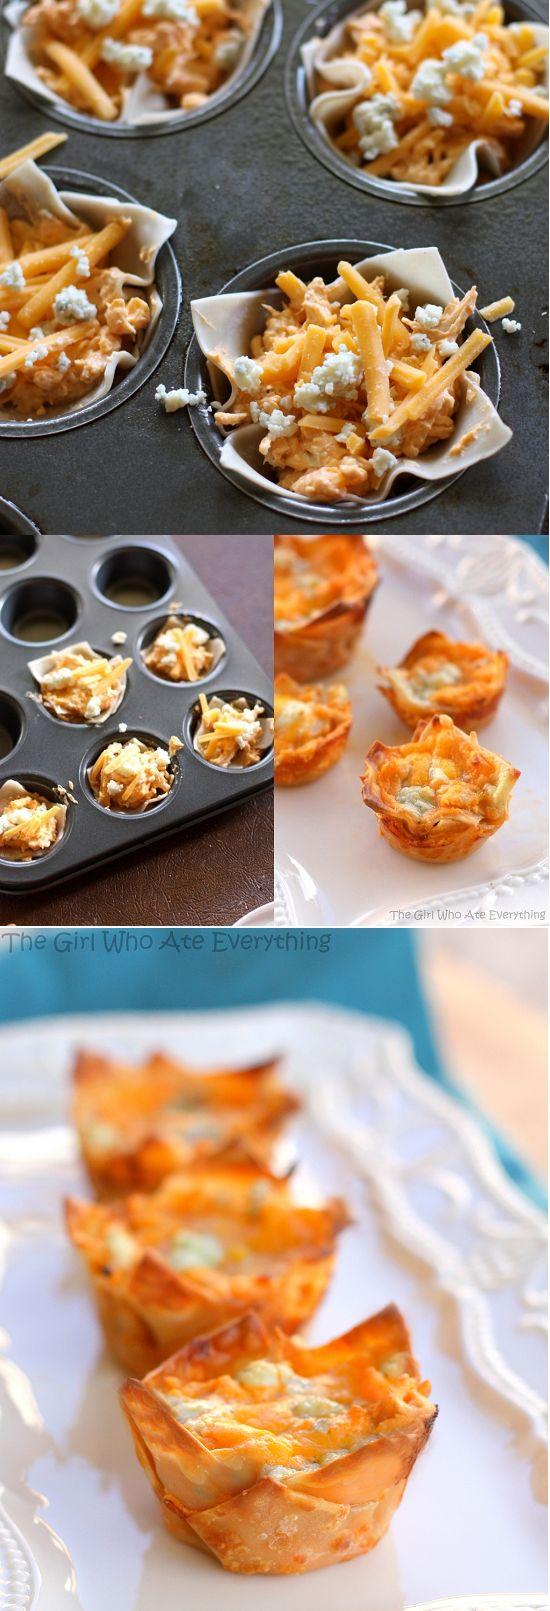 Mini Buffalo chicken cupcakes recipes by cupcakepedia, cupcakes, dessert, dinner, food